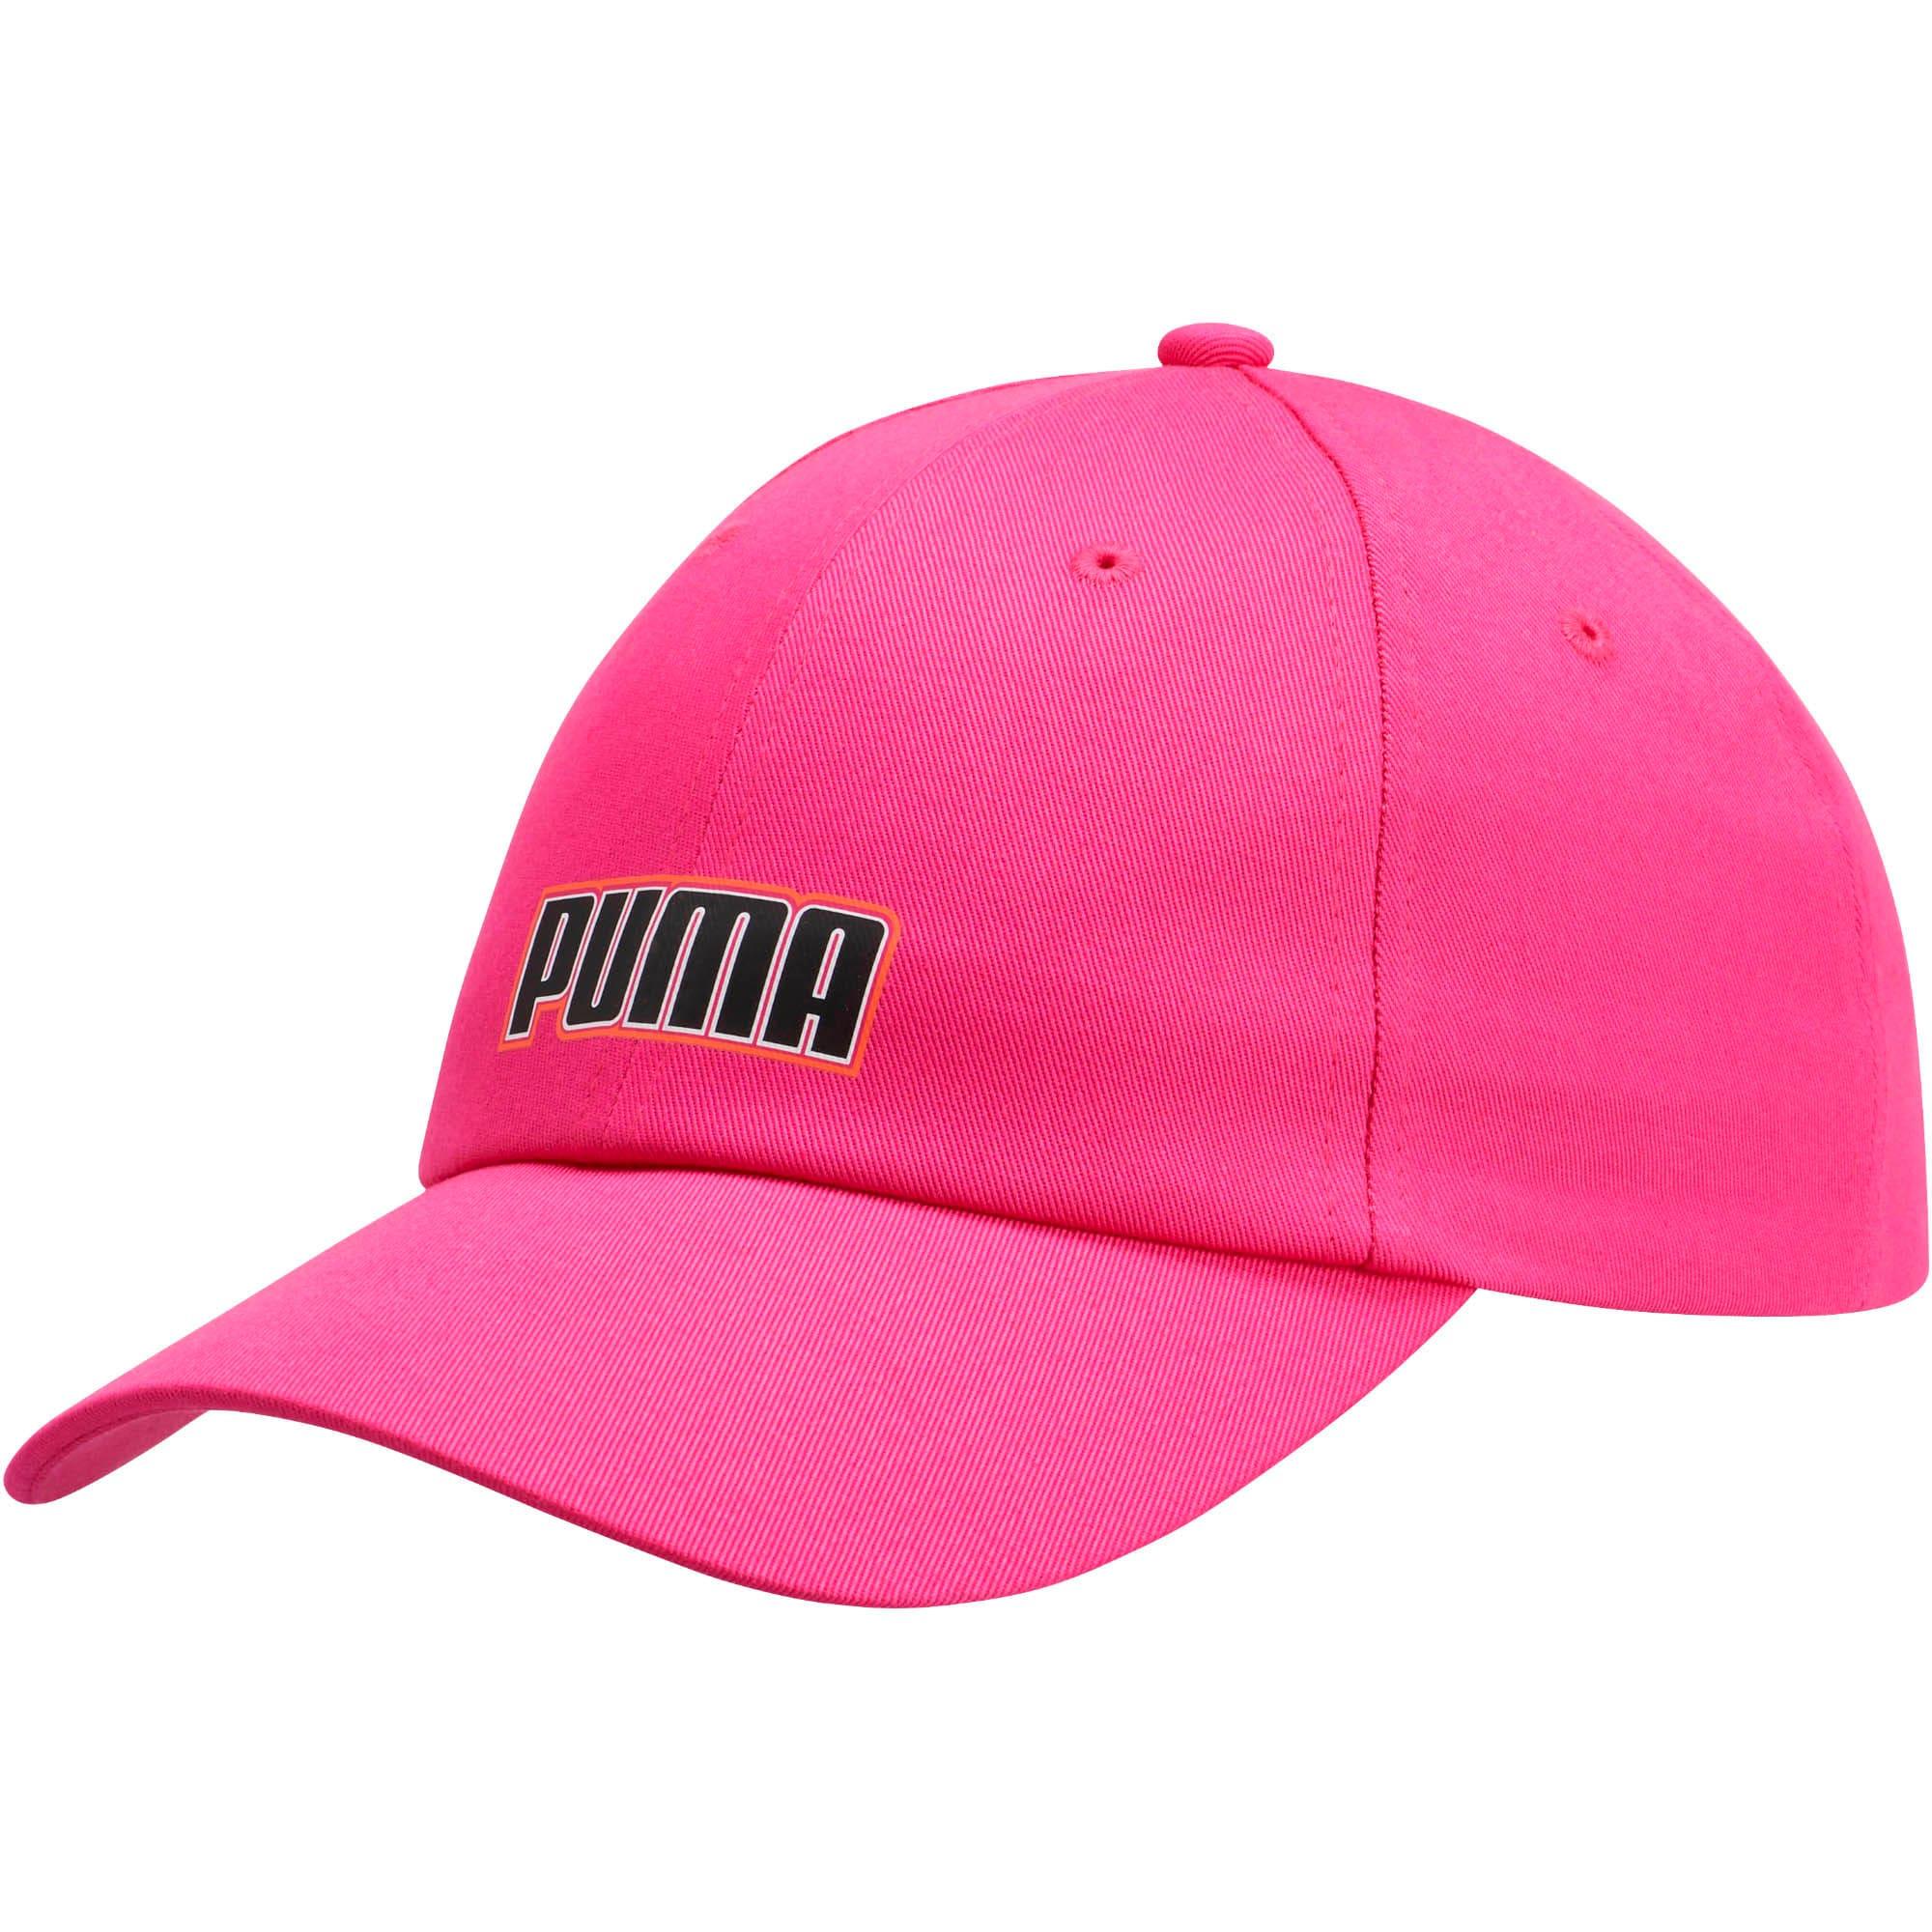 Thumbnail 1 of Rebel Reload Hat, Fuchsia Purple, medium